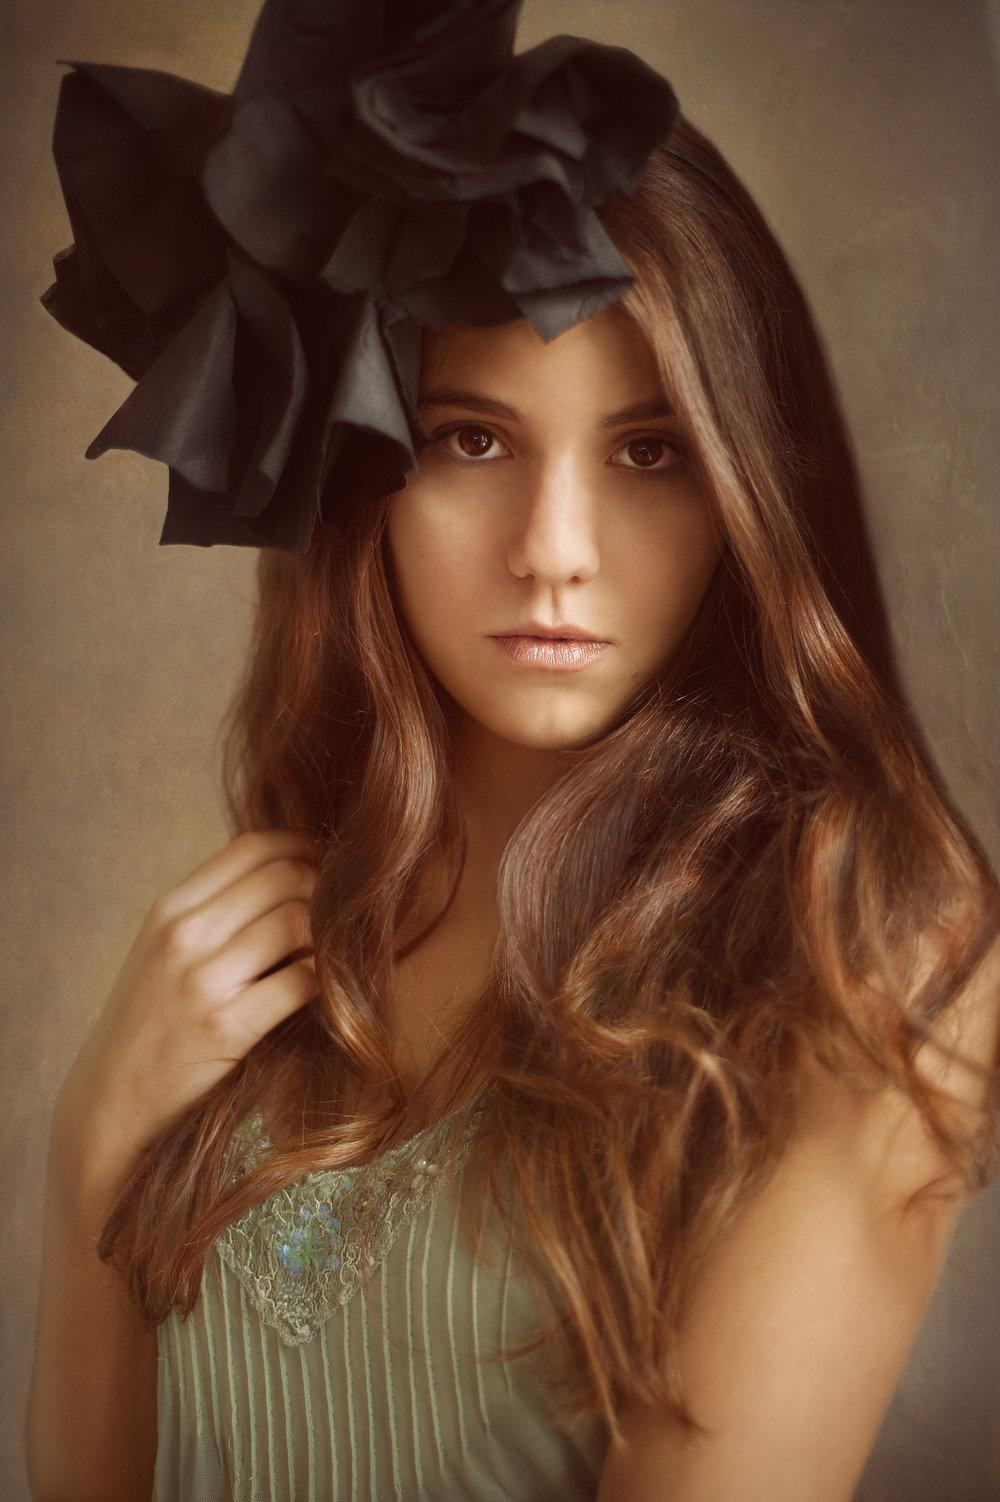 Marta-Hewson-Themed-portrait-young-women-with-black-flower-in-hair.jpg